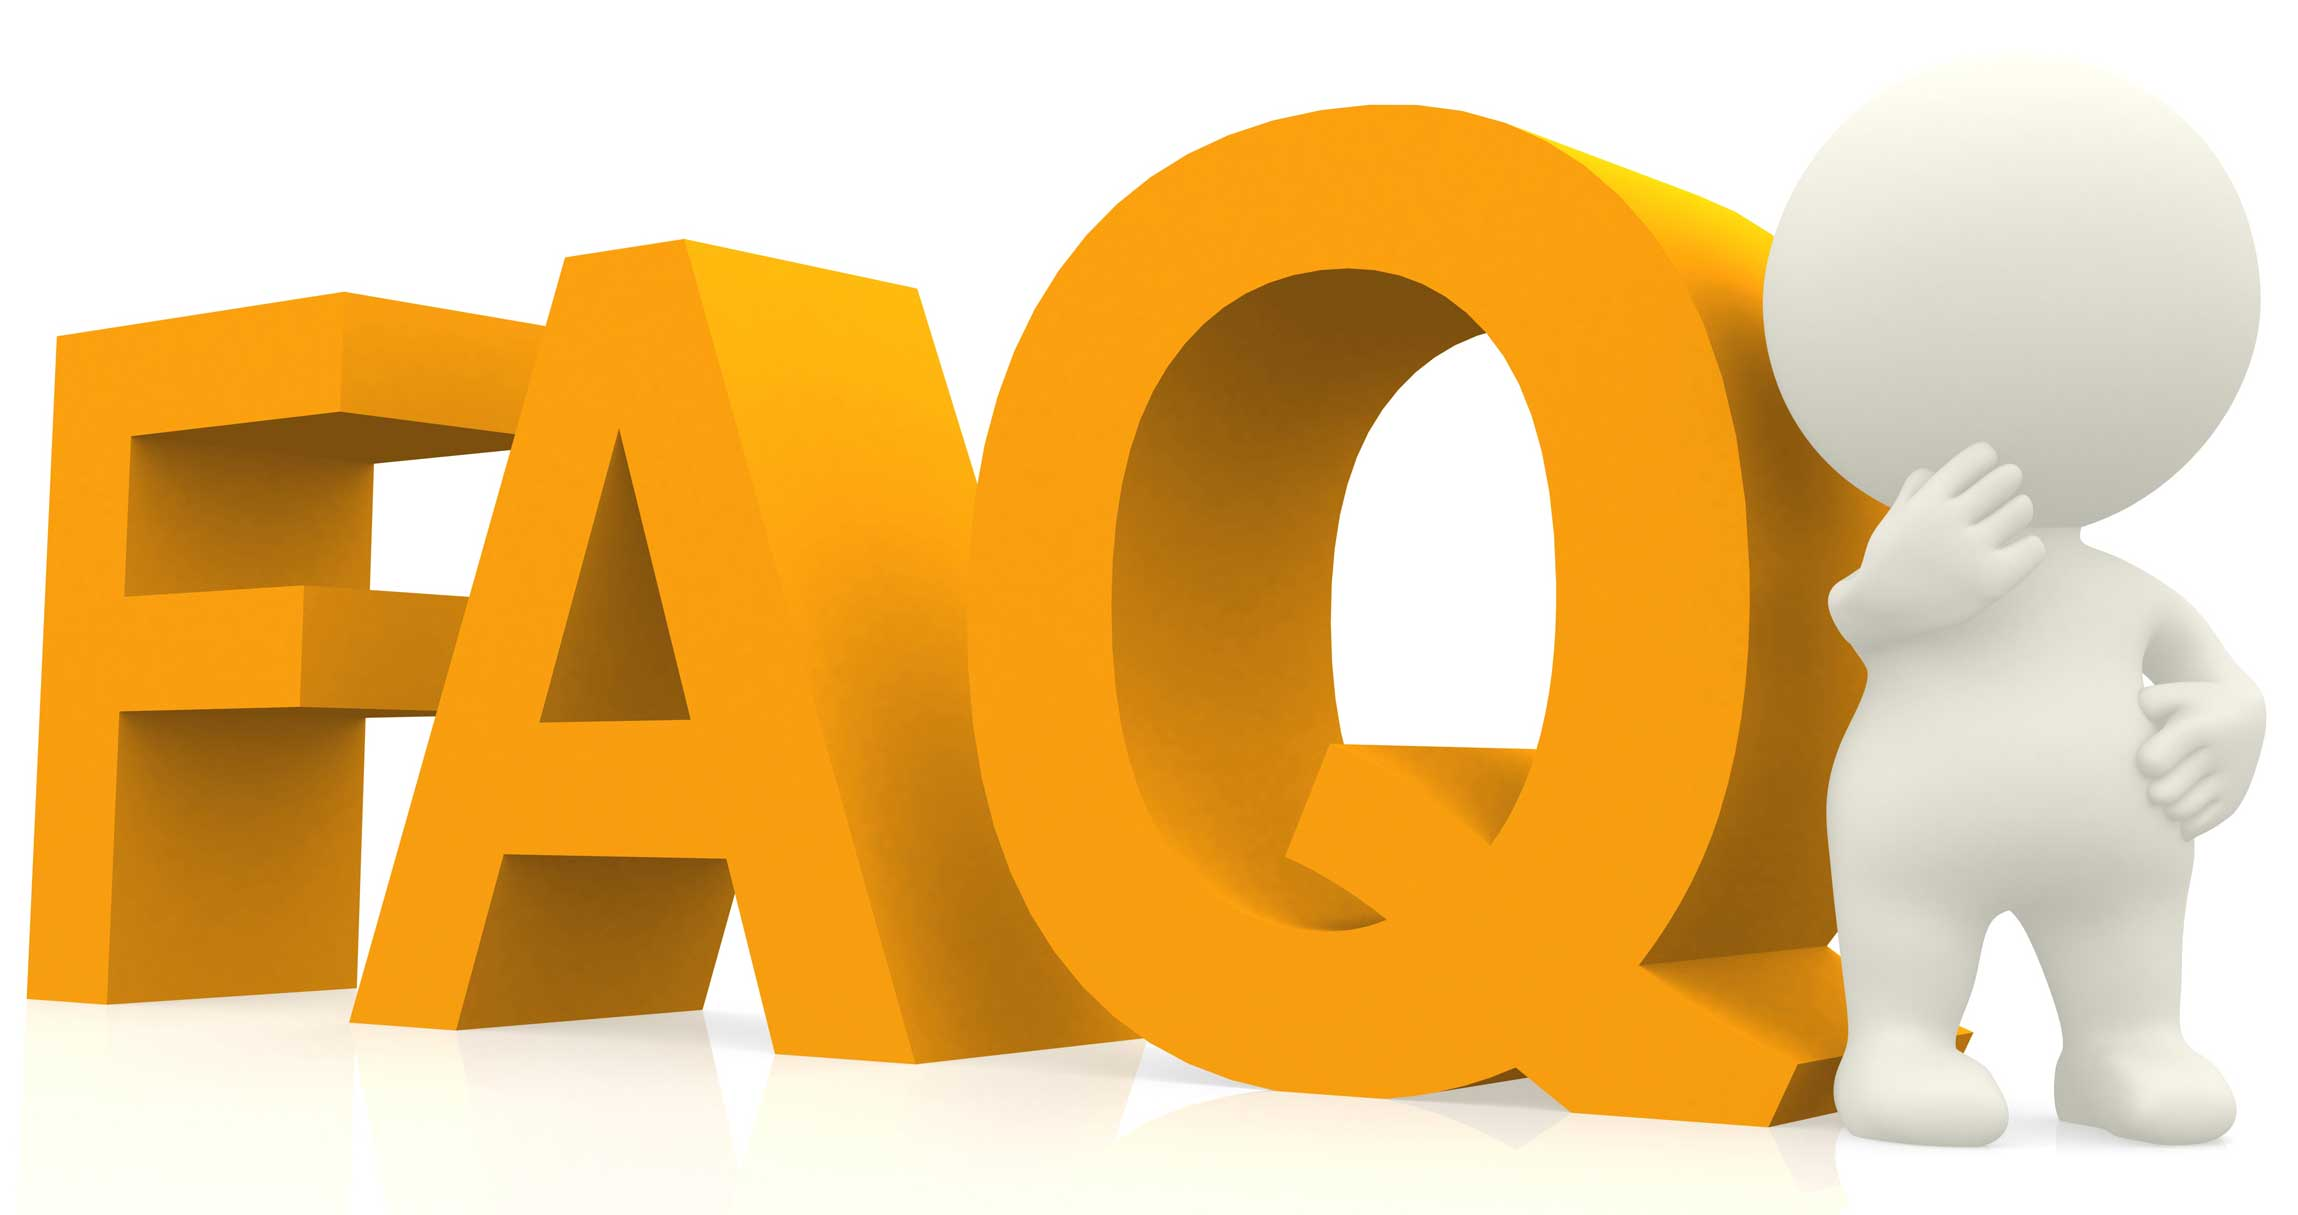 Ebay FAQ